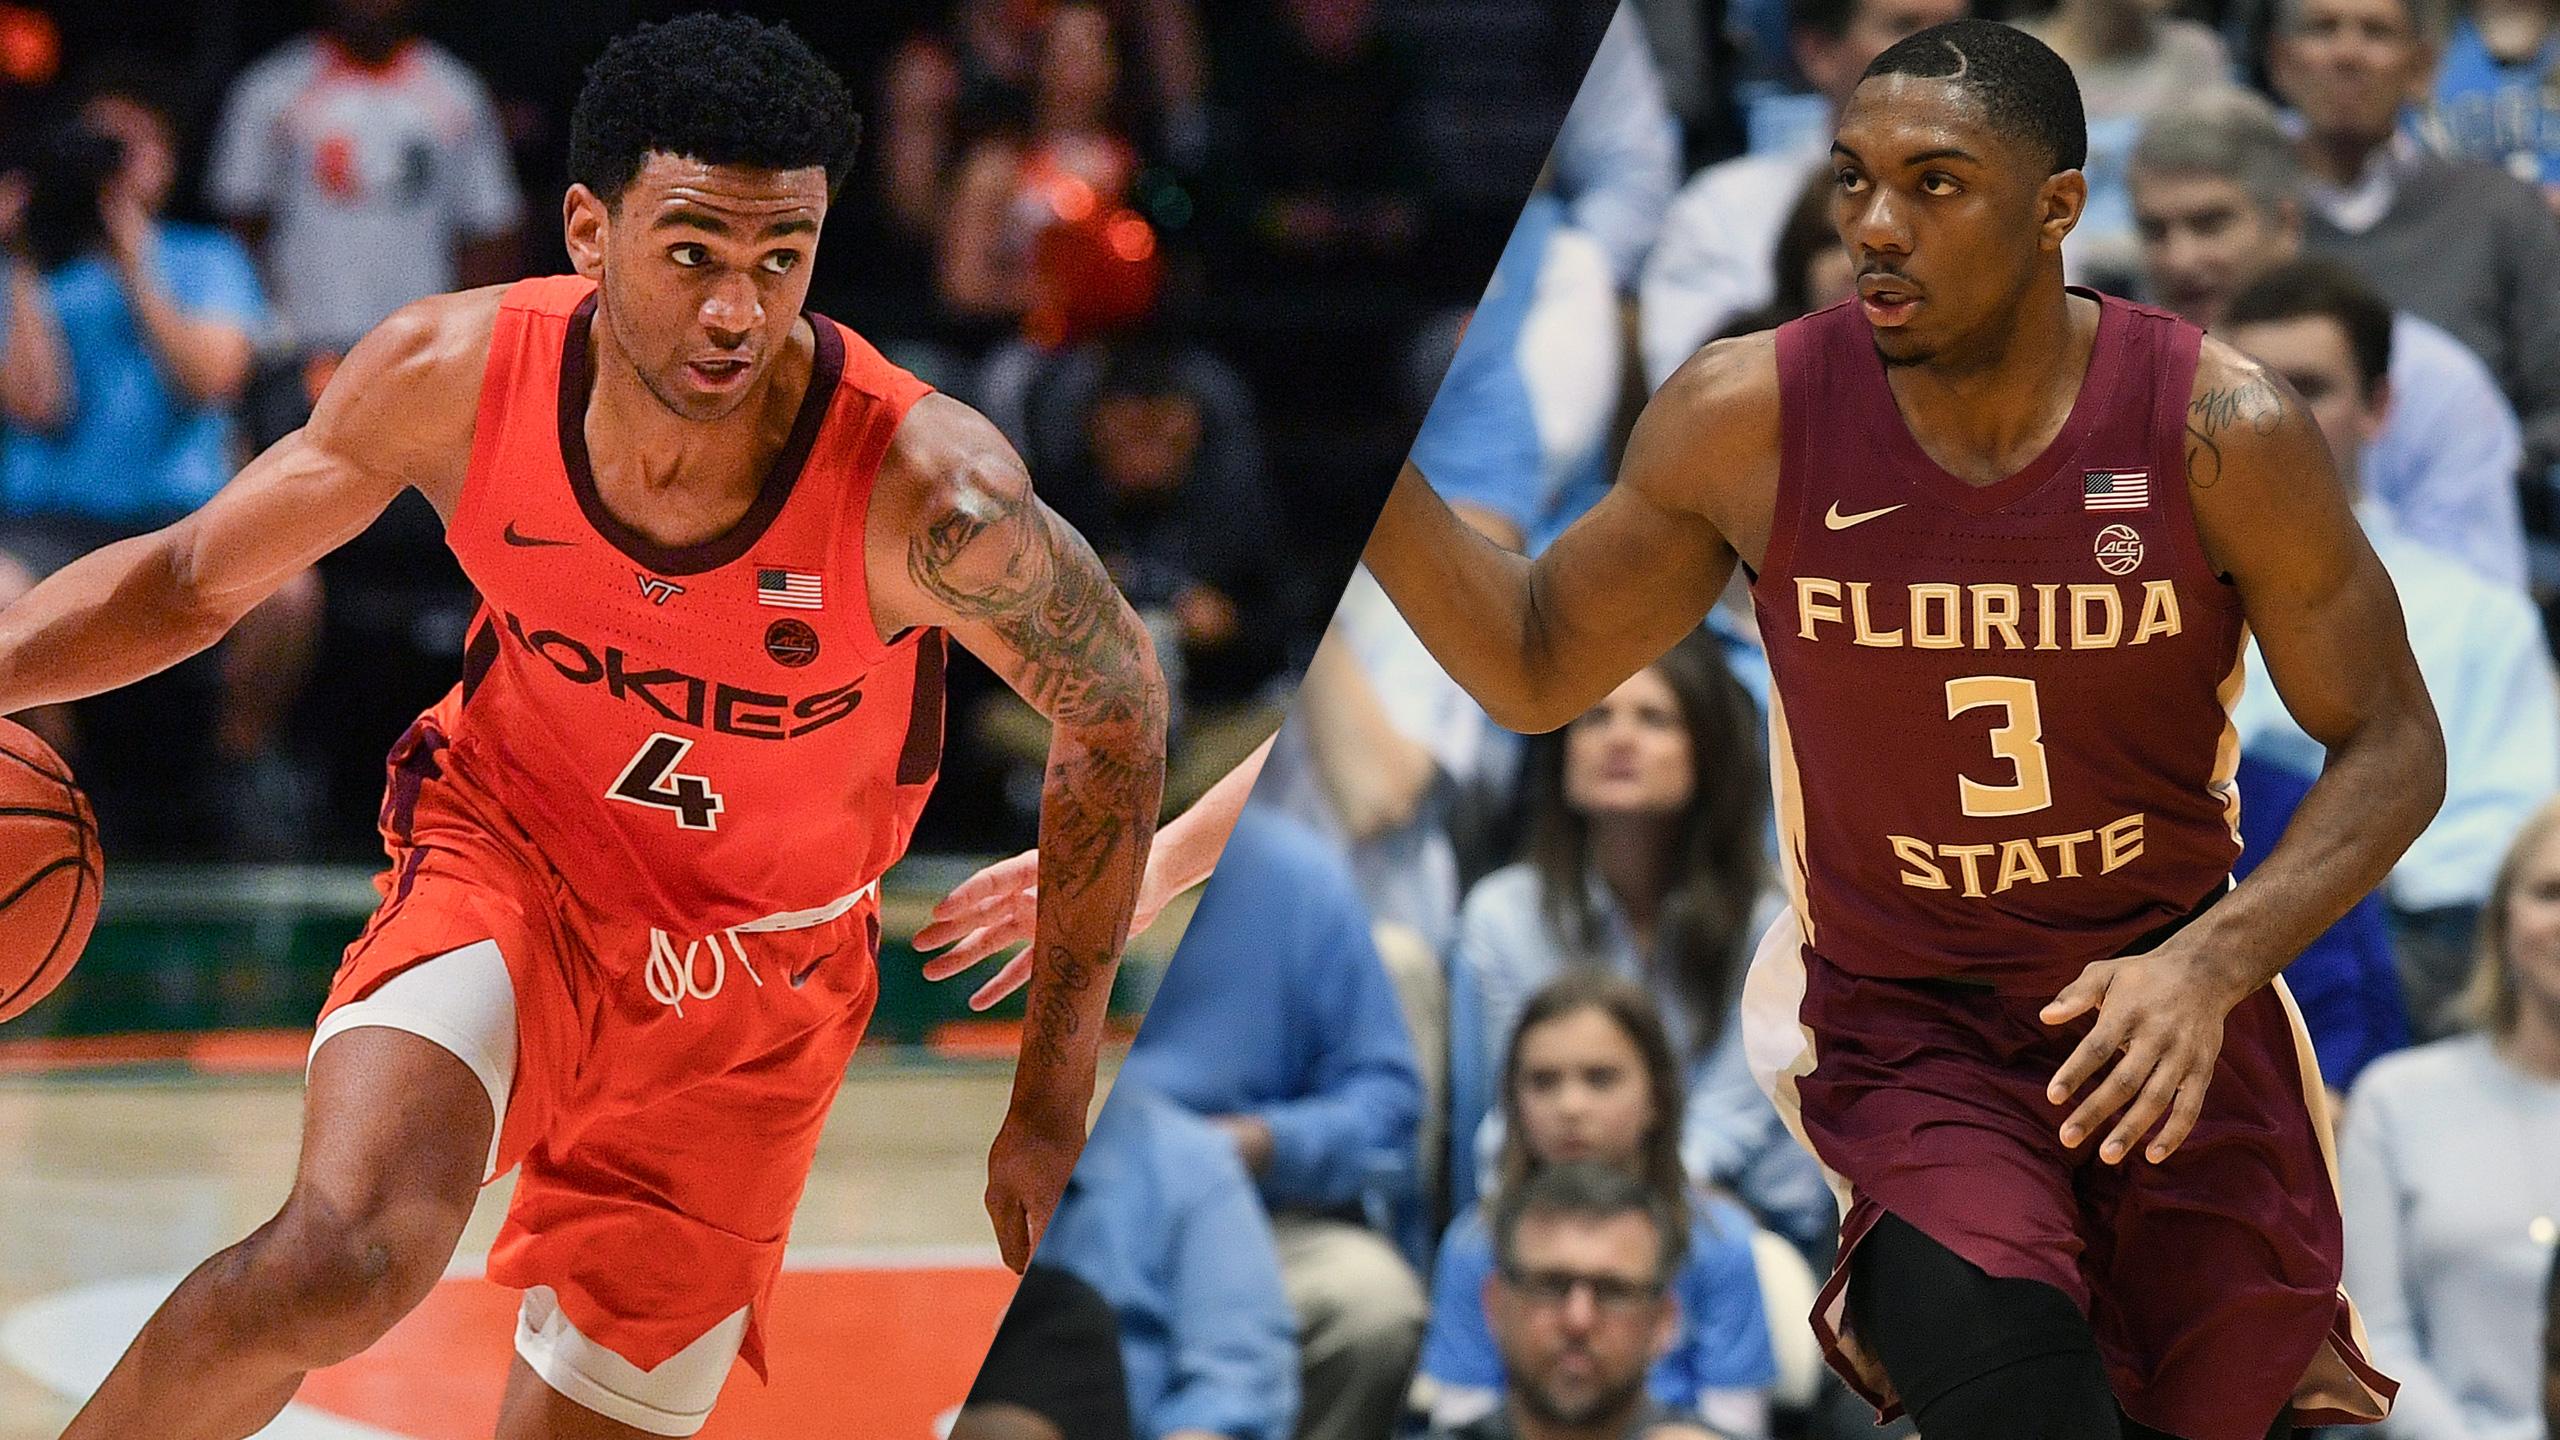 #16 Virginia Tech vs. #12 Florida State (Quarterfinal #2) (ACC Men's Basketball Tournament)